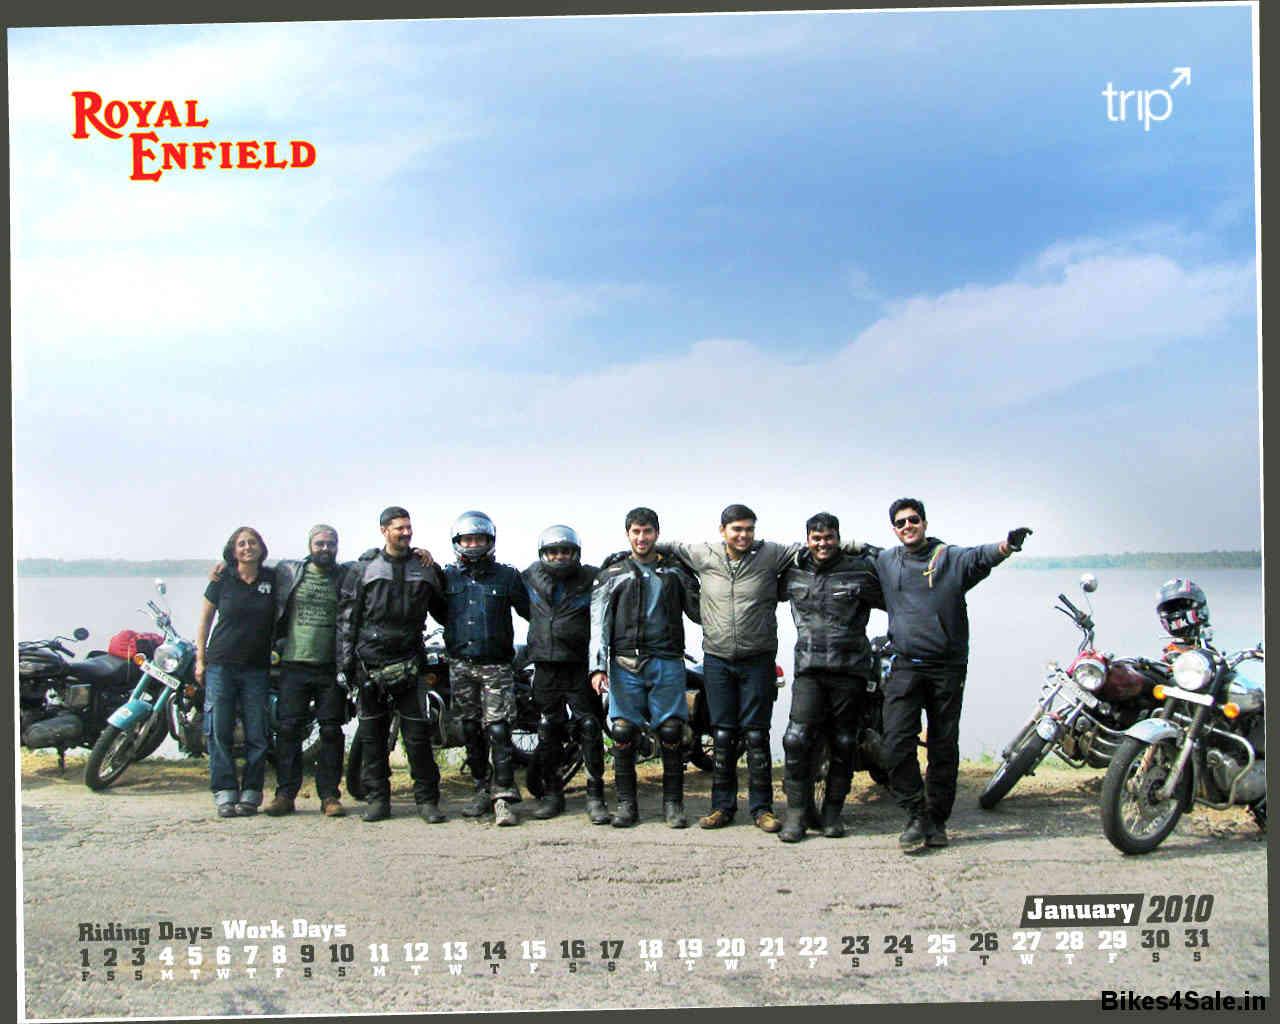 Royal Enfield Calendar 2010